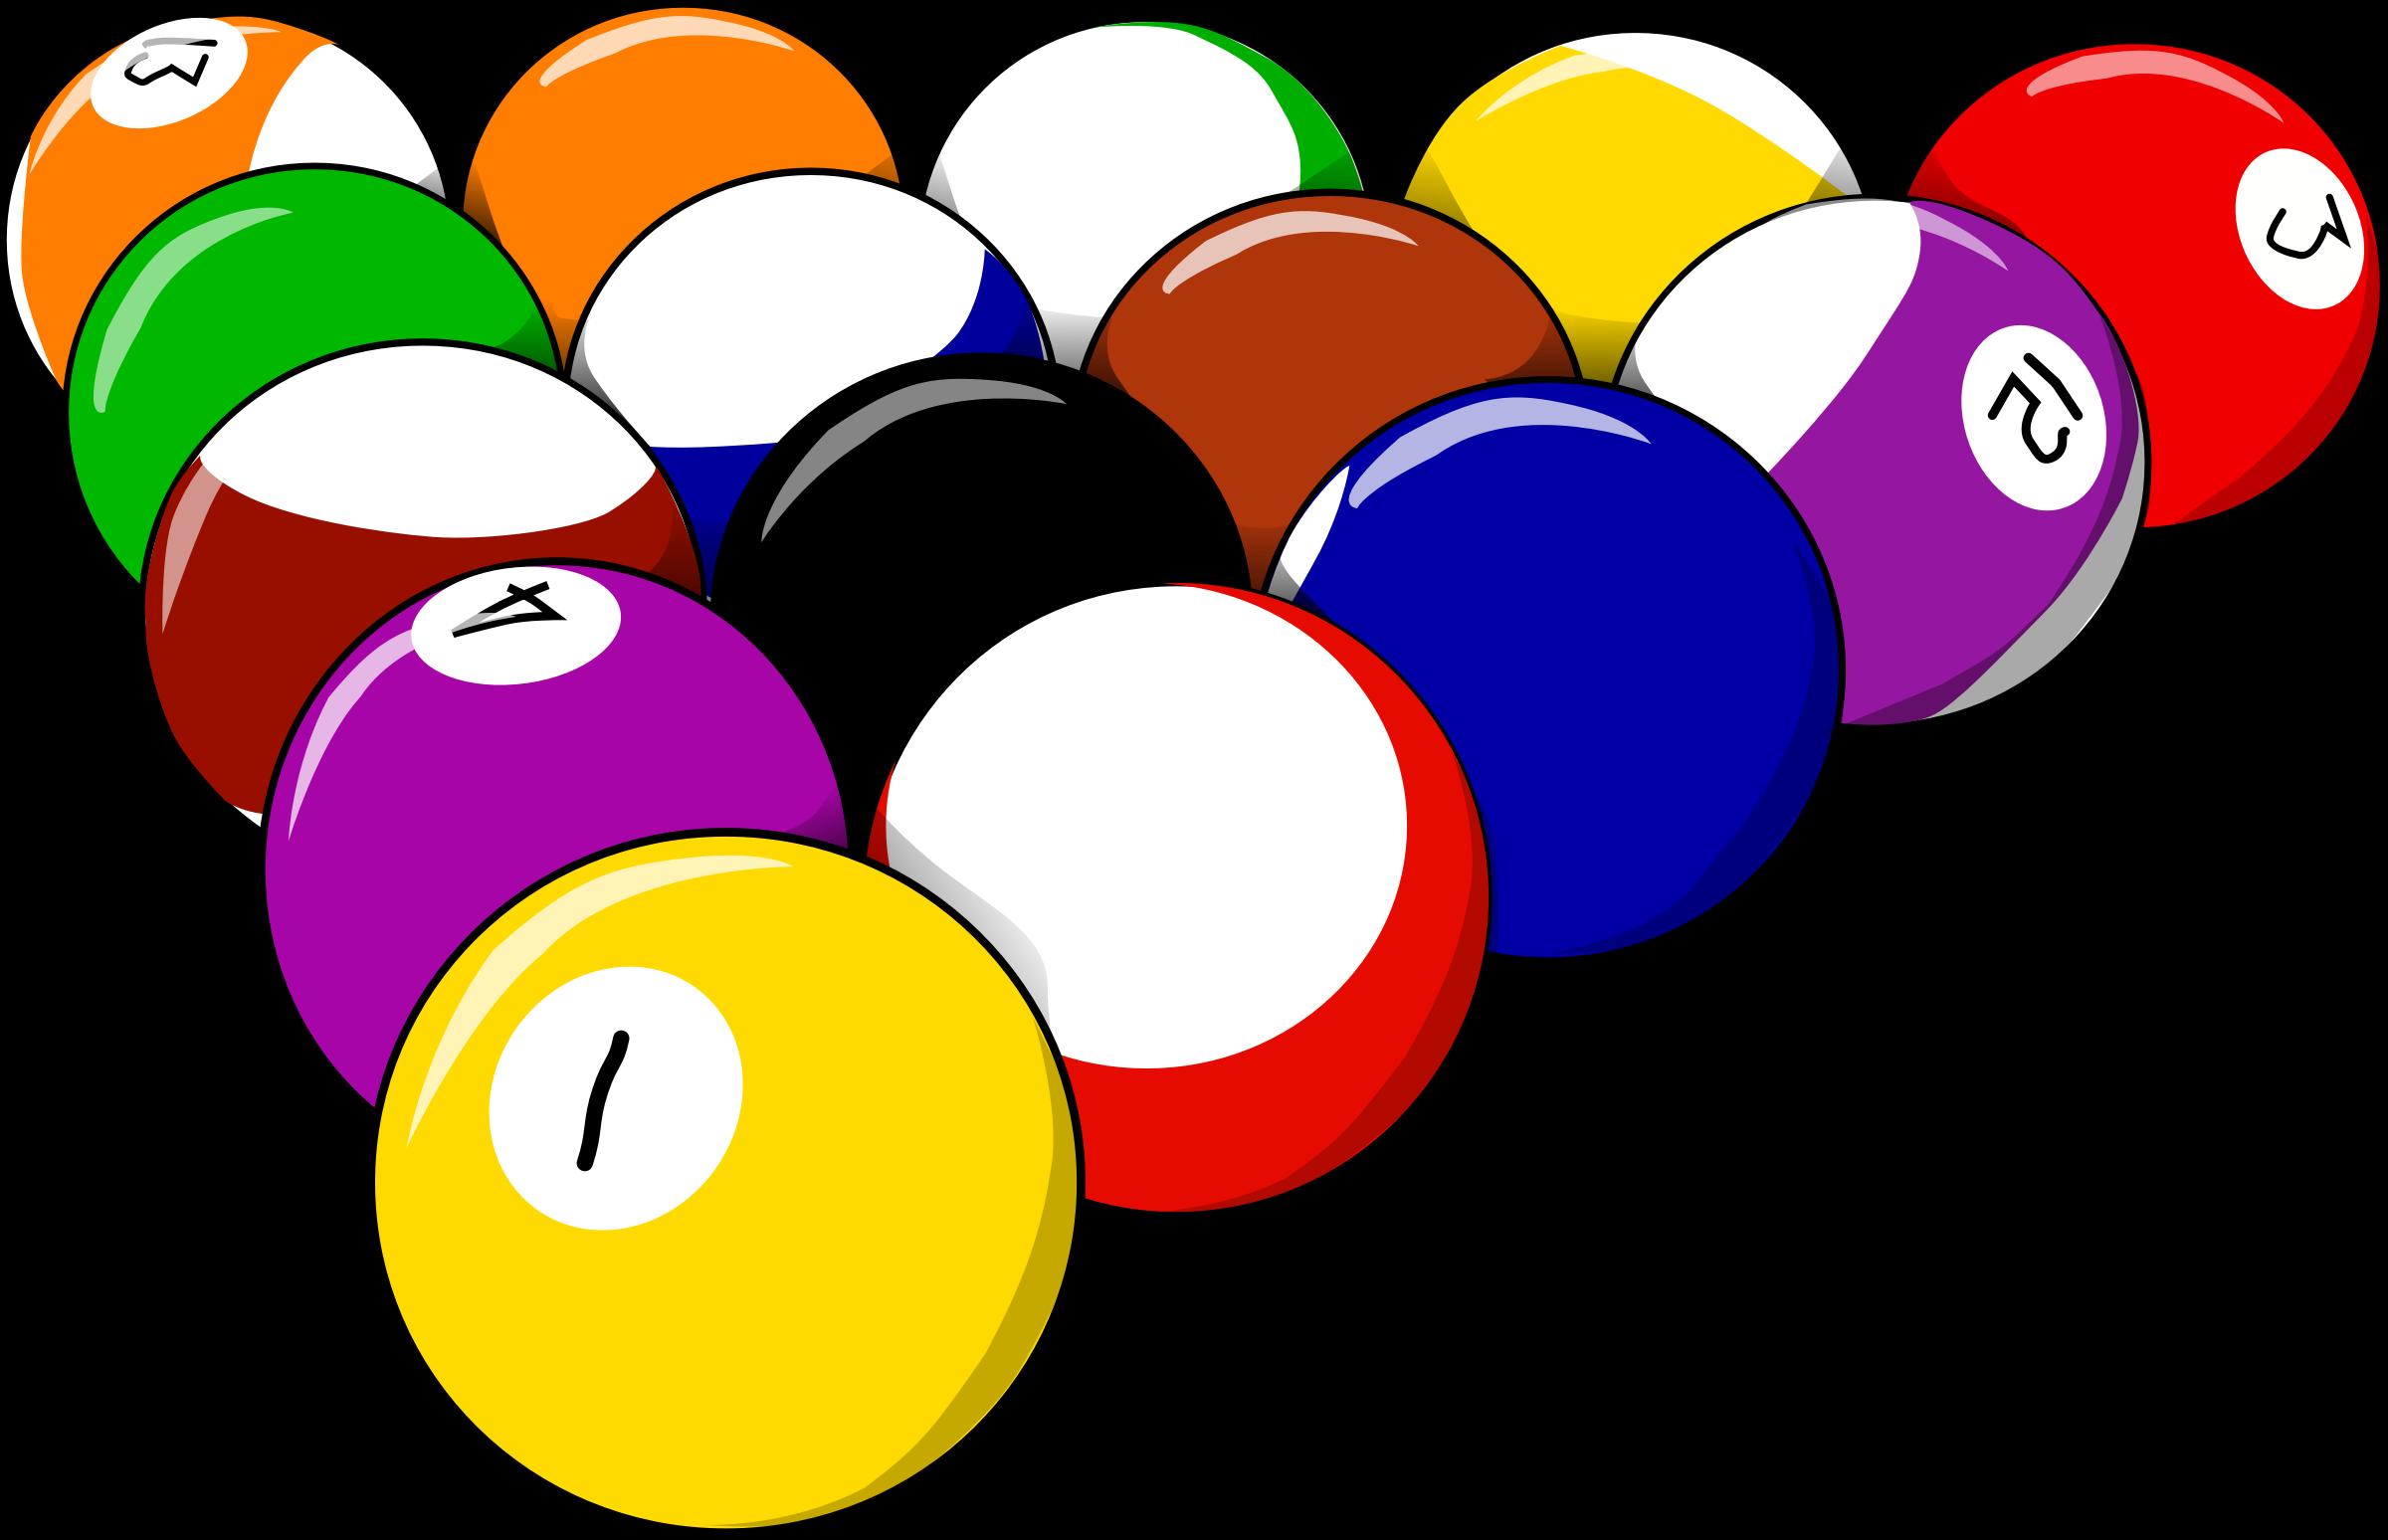 clipart 15 balls rh openclipart org ball clip art free balls clipart images